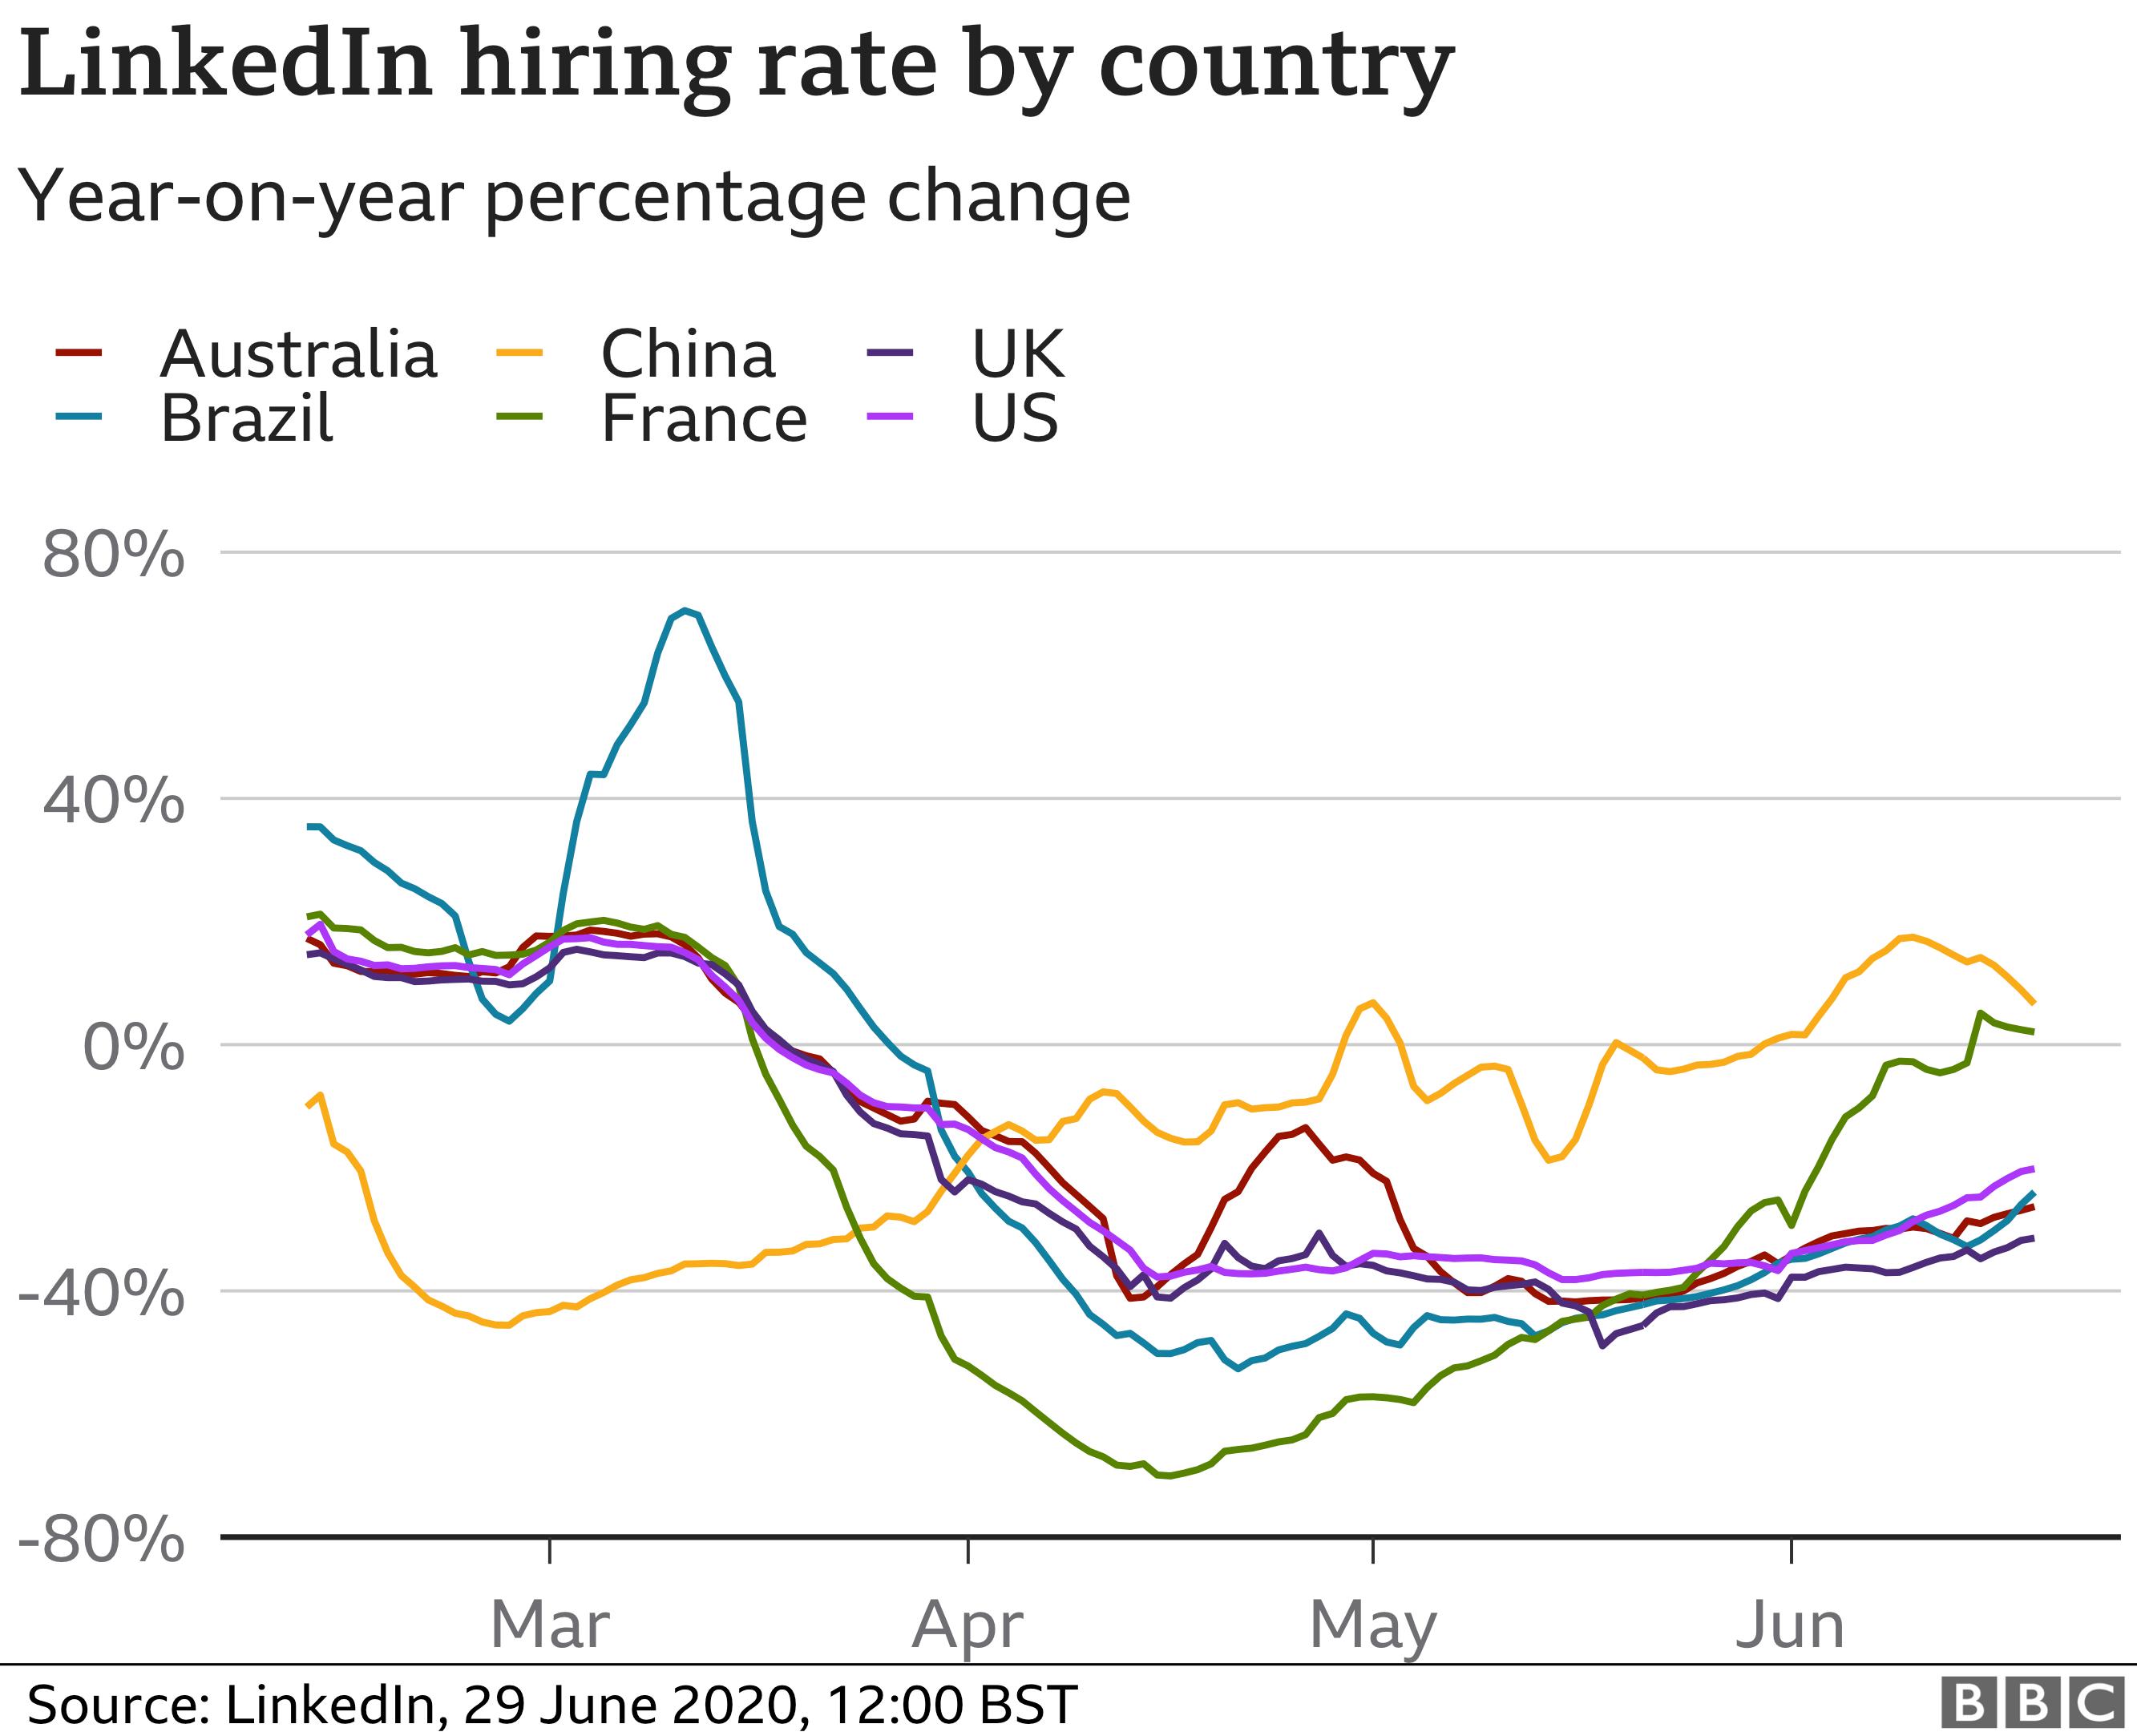 Hiring rates chart from LinkedIn